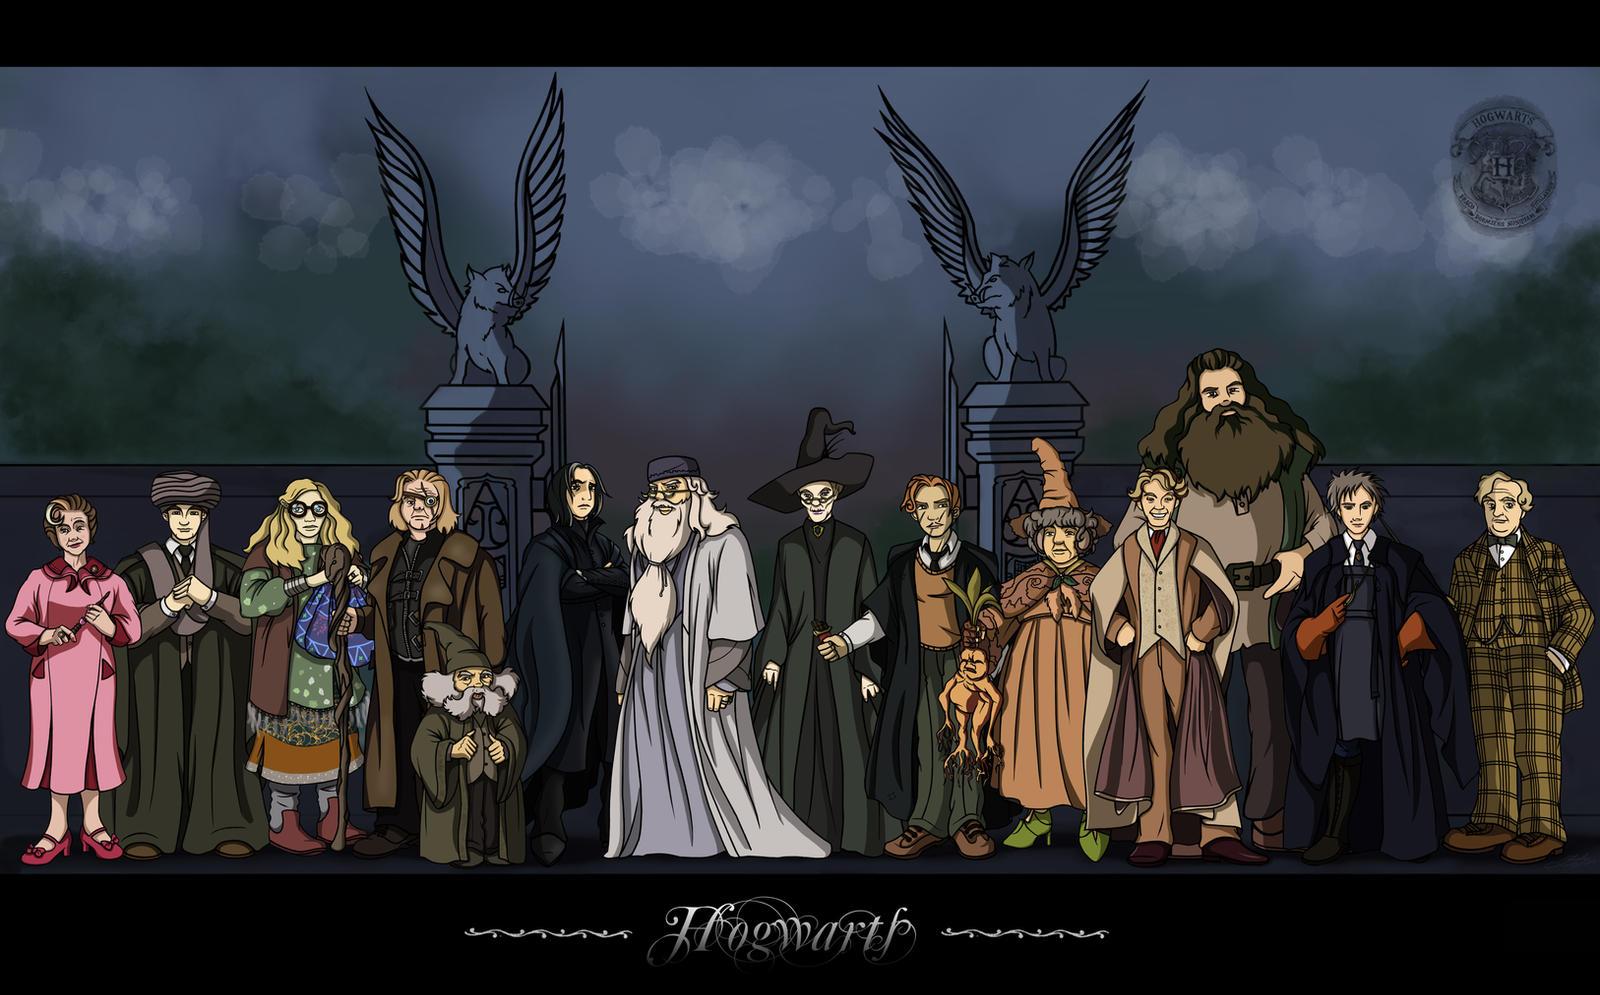 http://fc01.deviantart.net/fs70/i/2010/194/2/c/Hogwarts_Professors_by_Belegilgalad.jpg